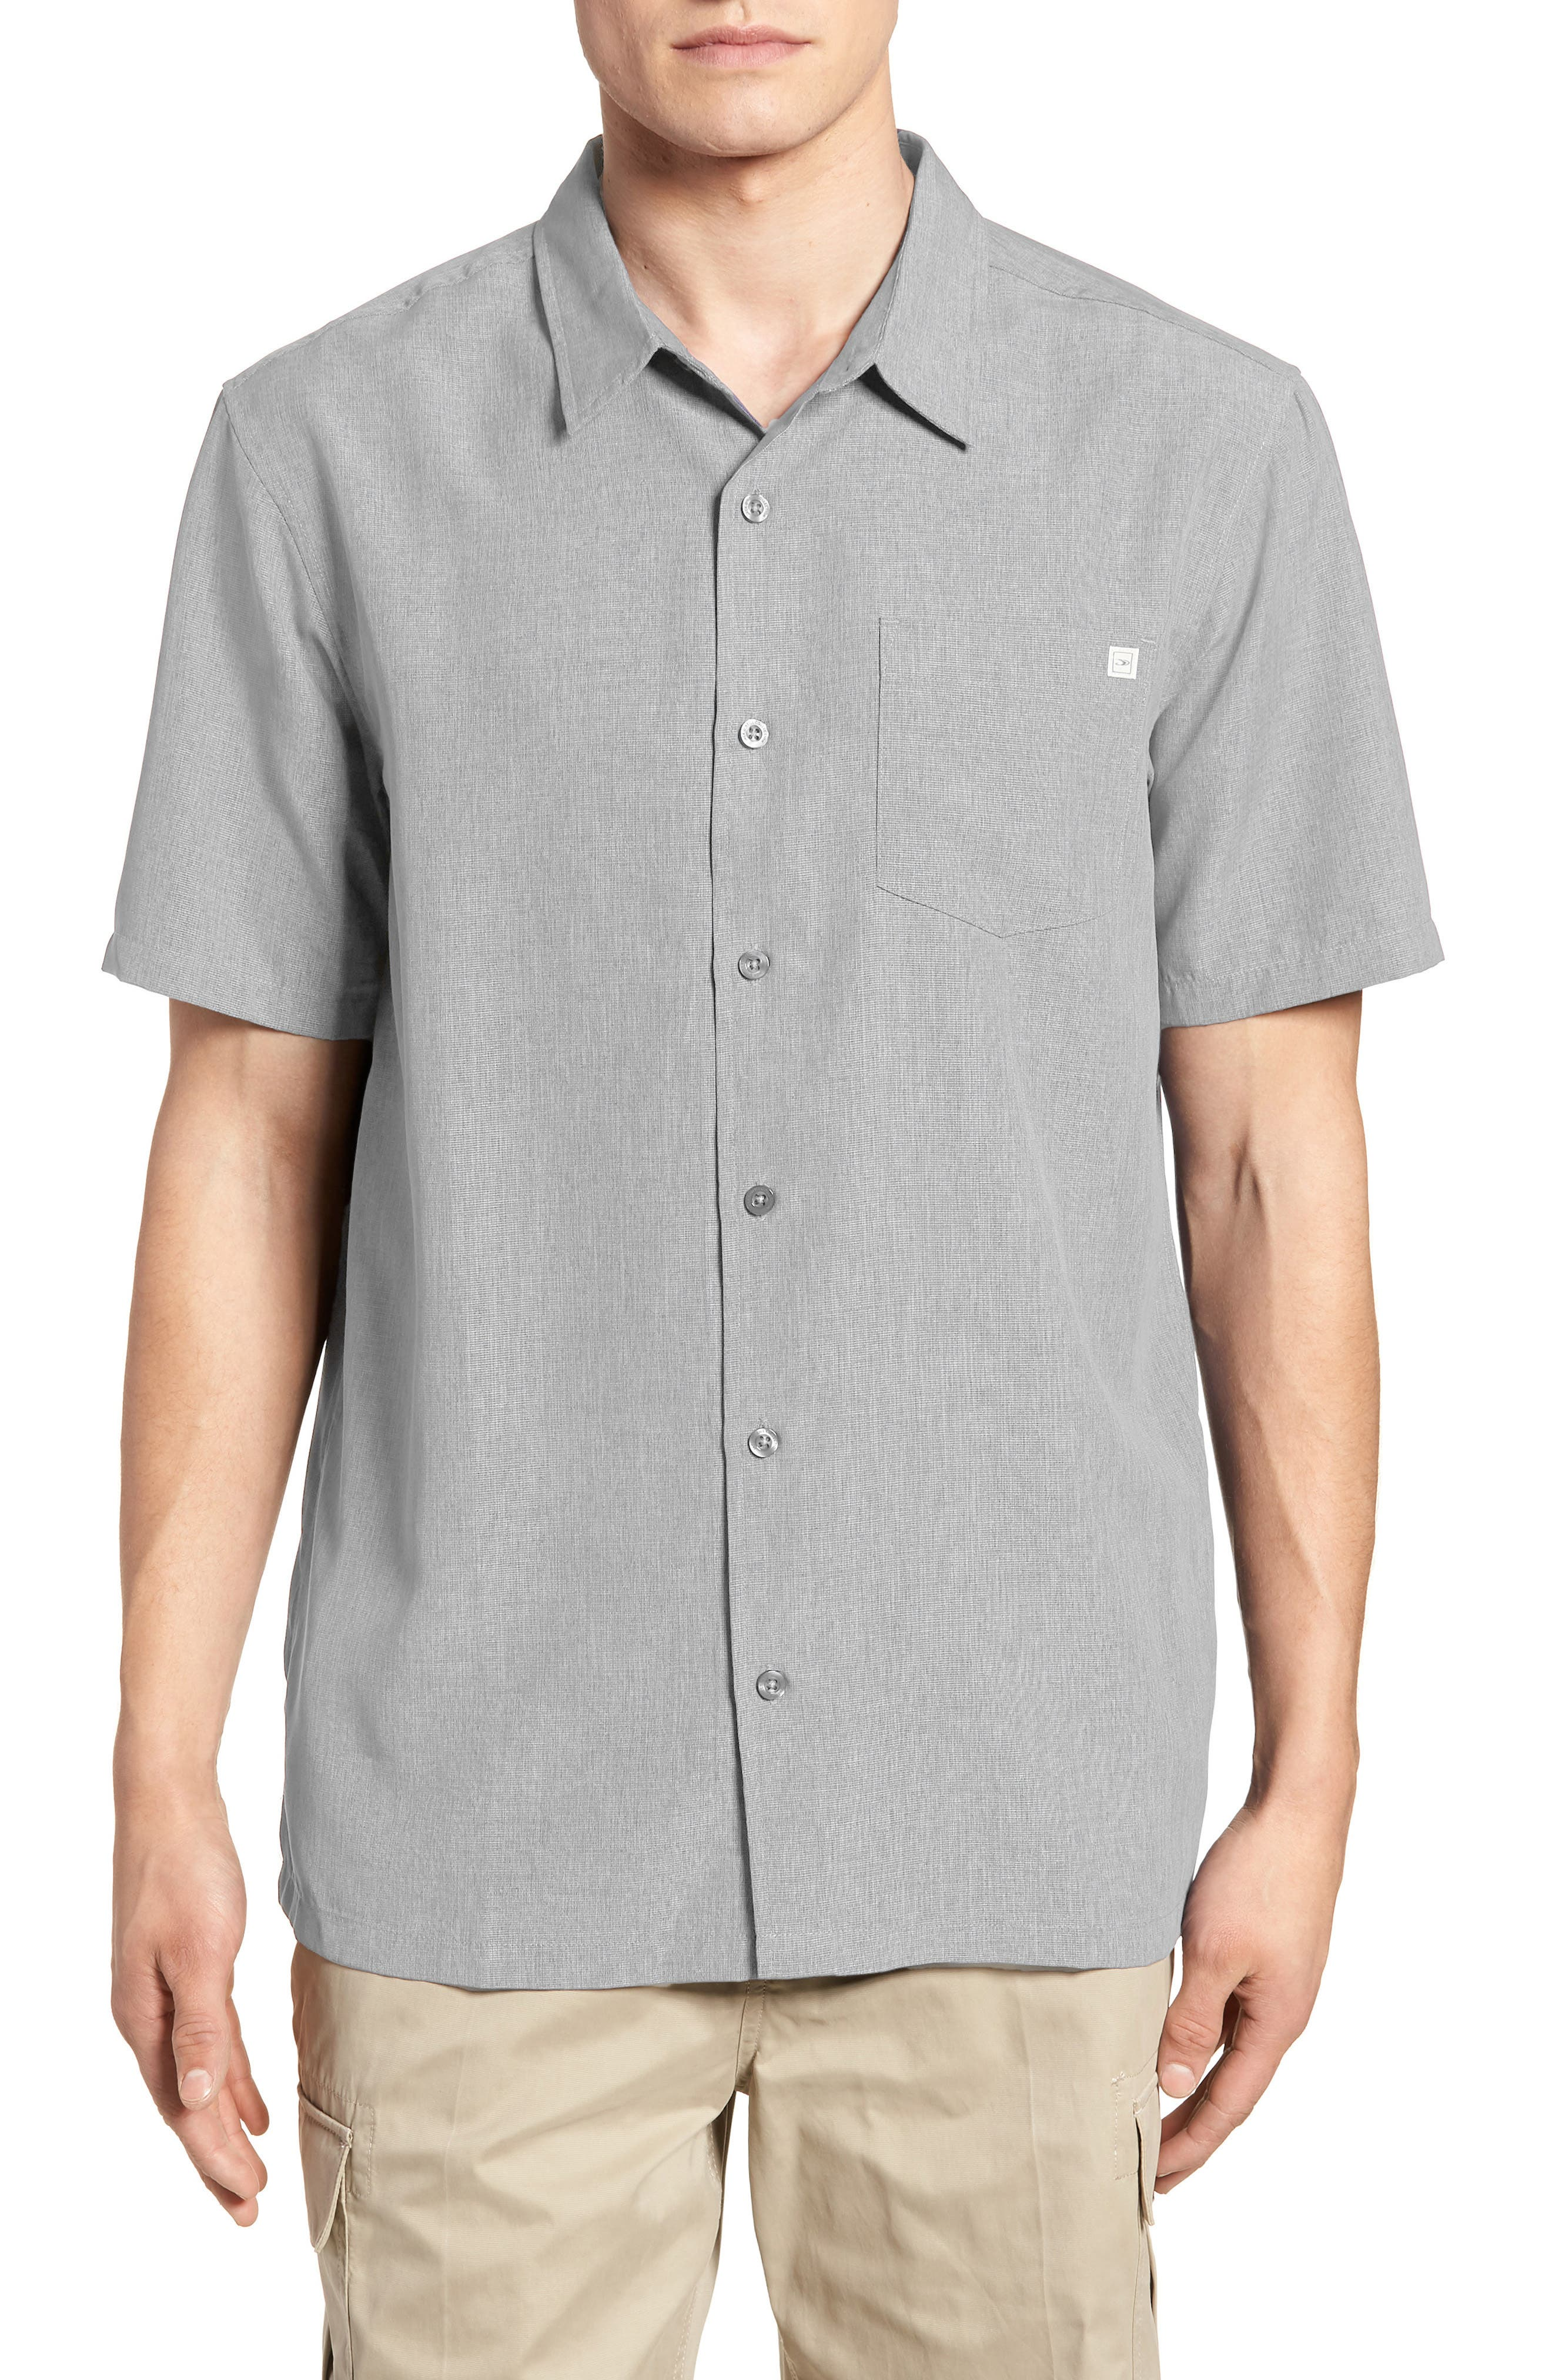 Liberty Regular Fit Short Sleeve Sport Shirt,                             Main thumbnail 1, color,                             Light Grey